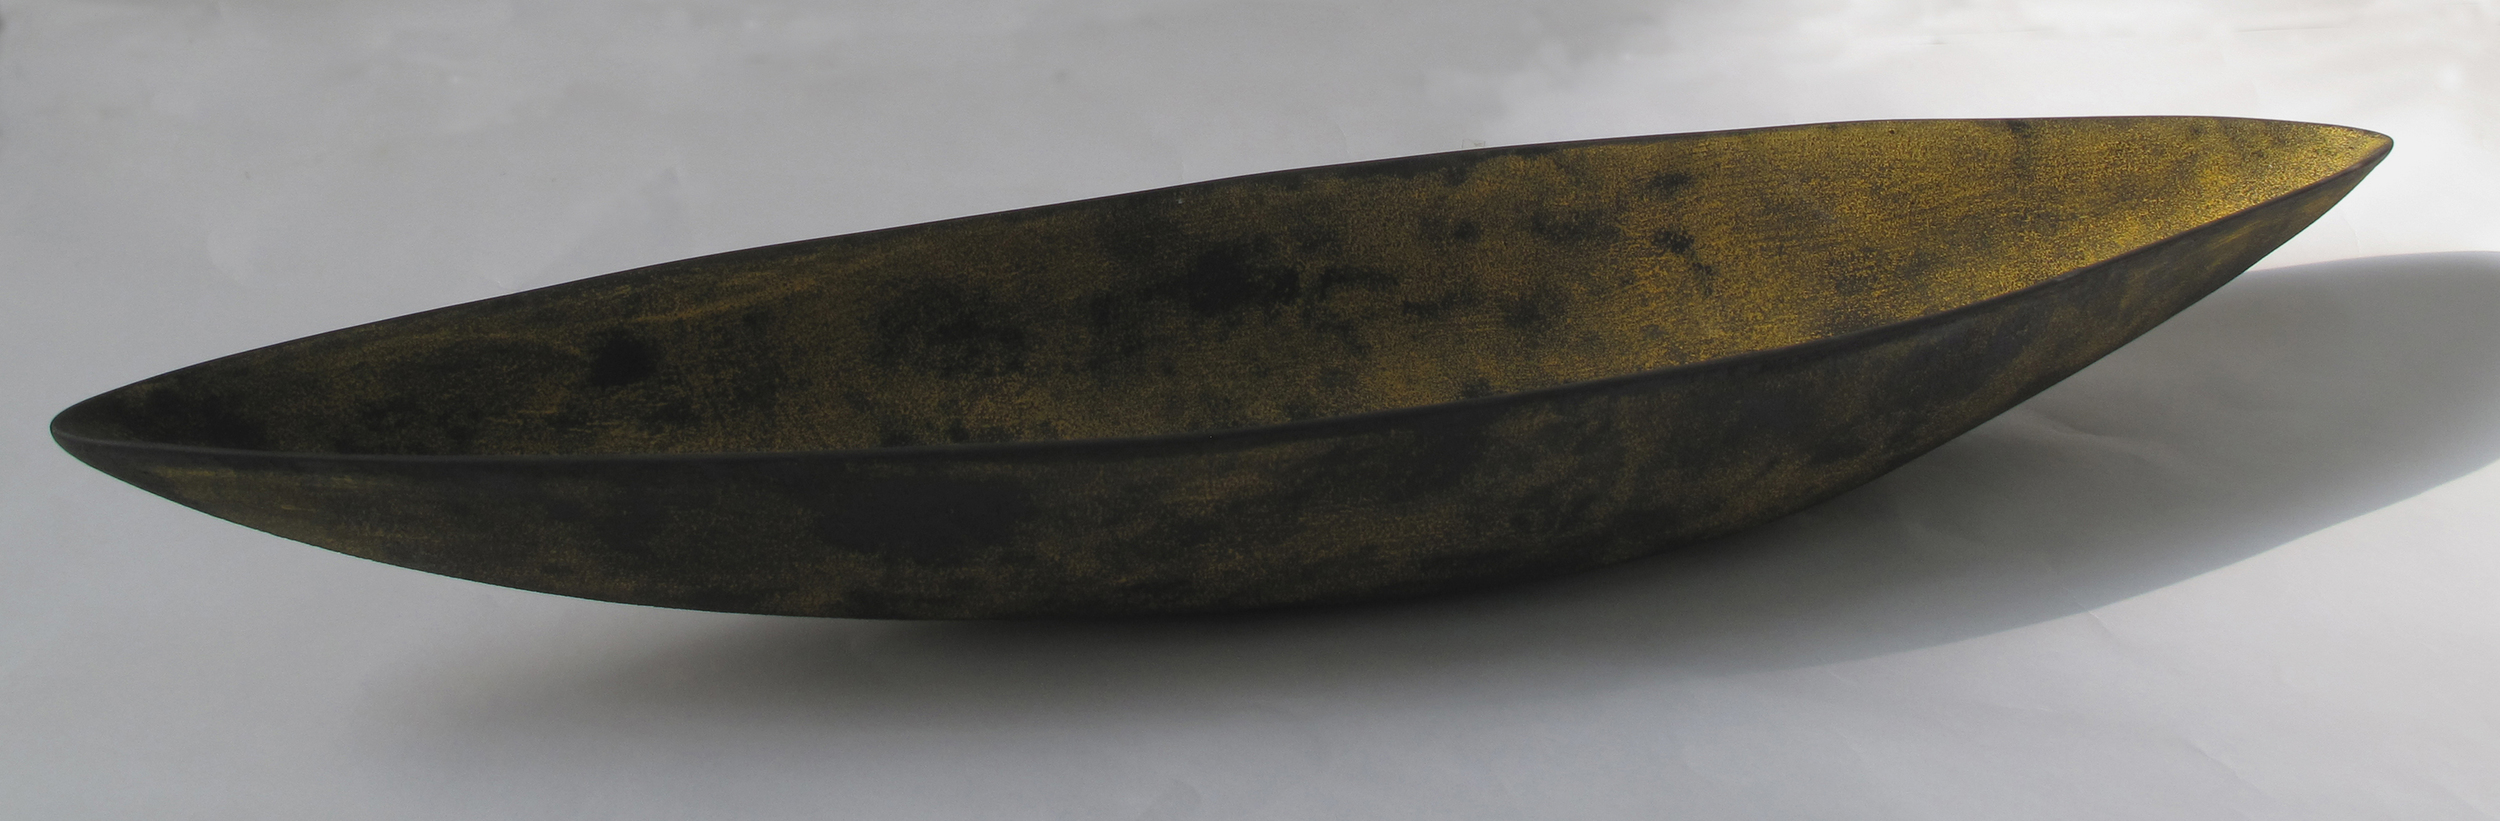 "Rust Pod  Kathy Erteman ET141 Ceramic Vessel 3"" x 37"" x 10"""